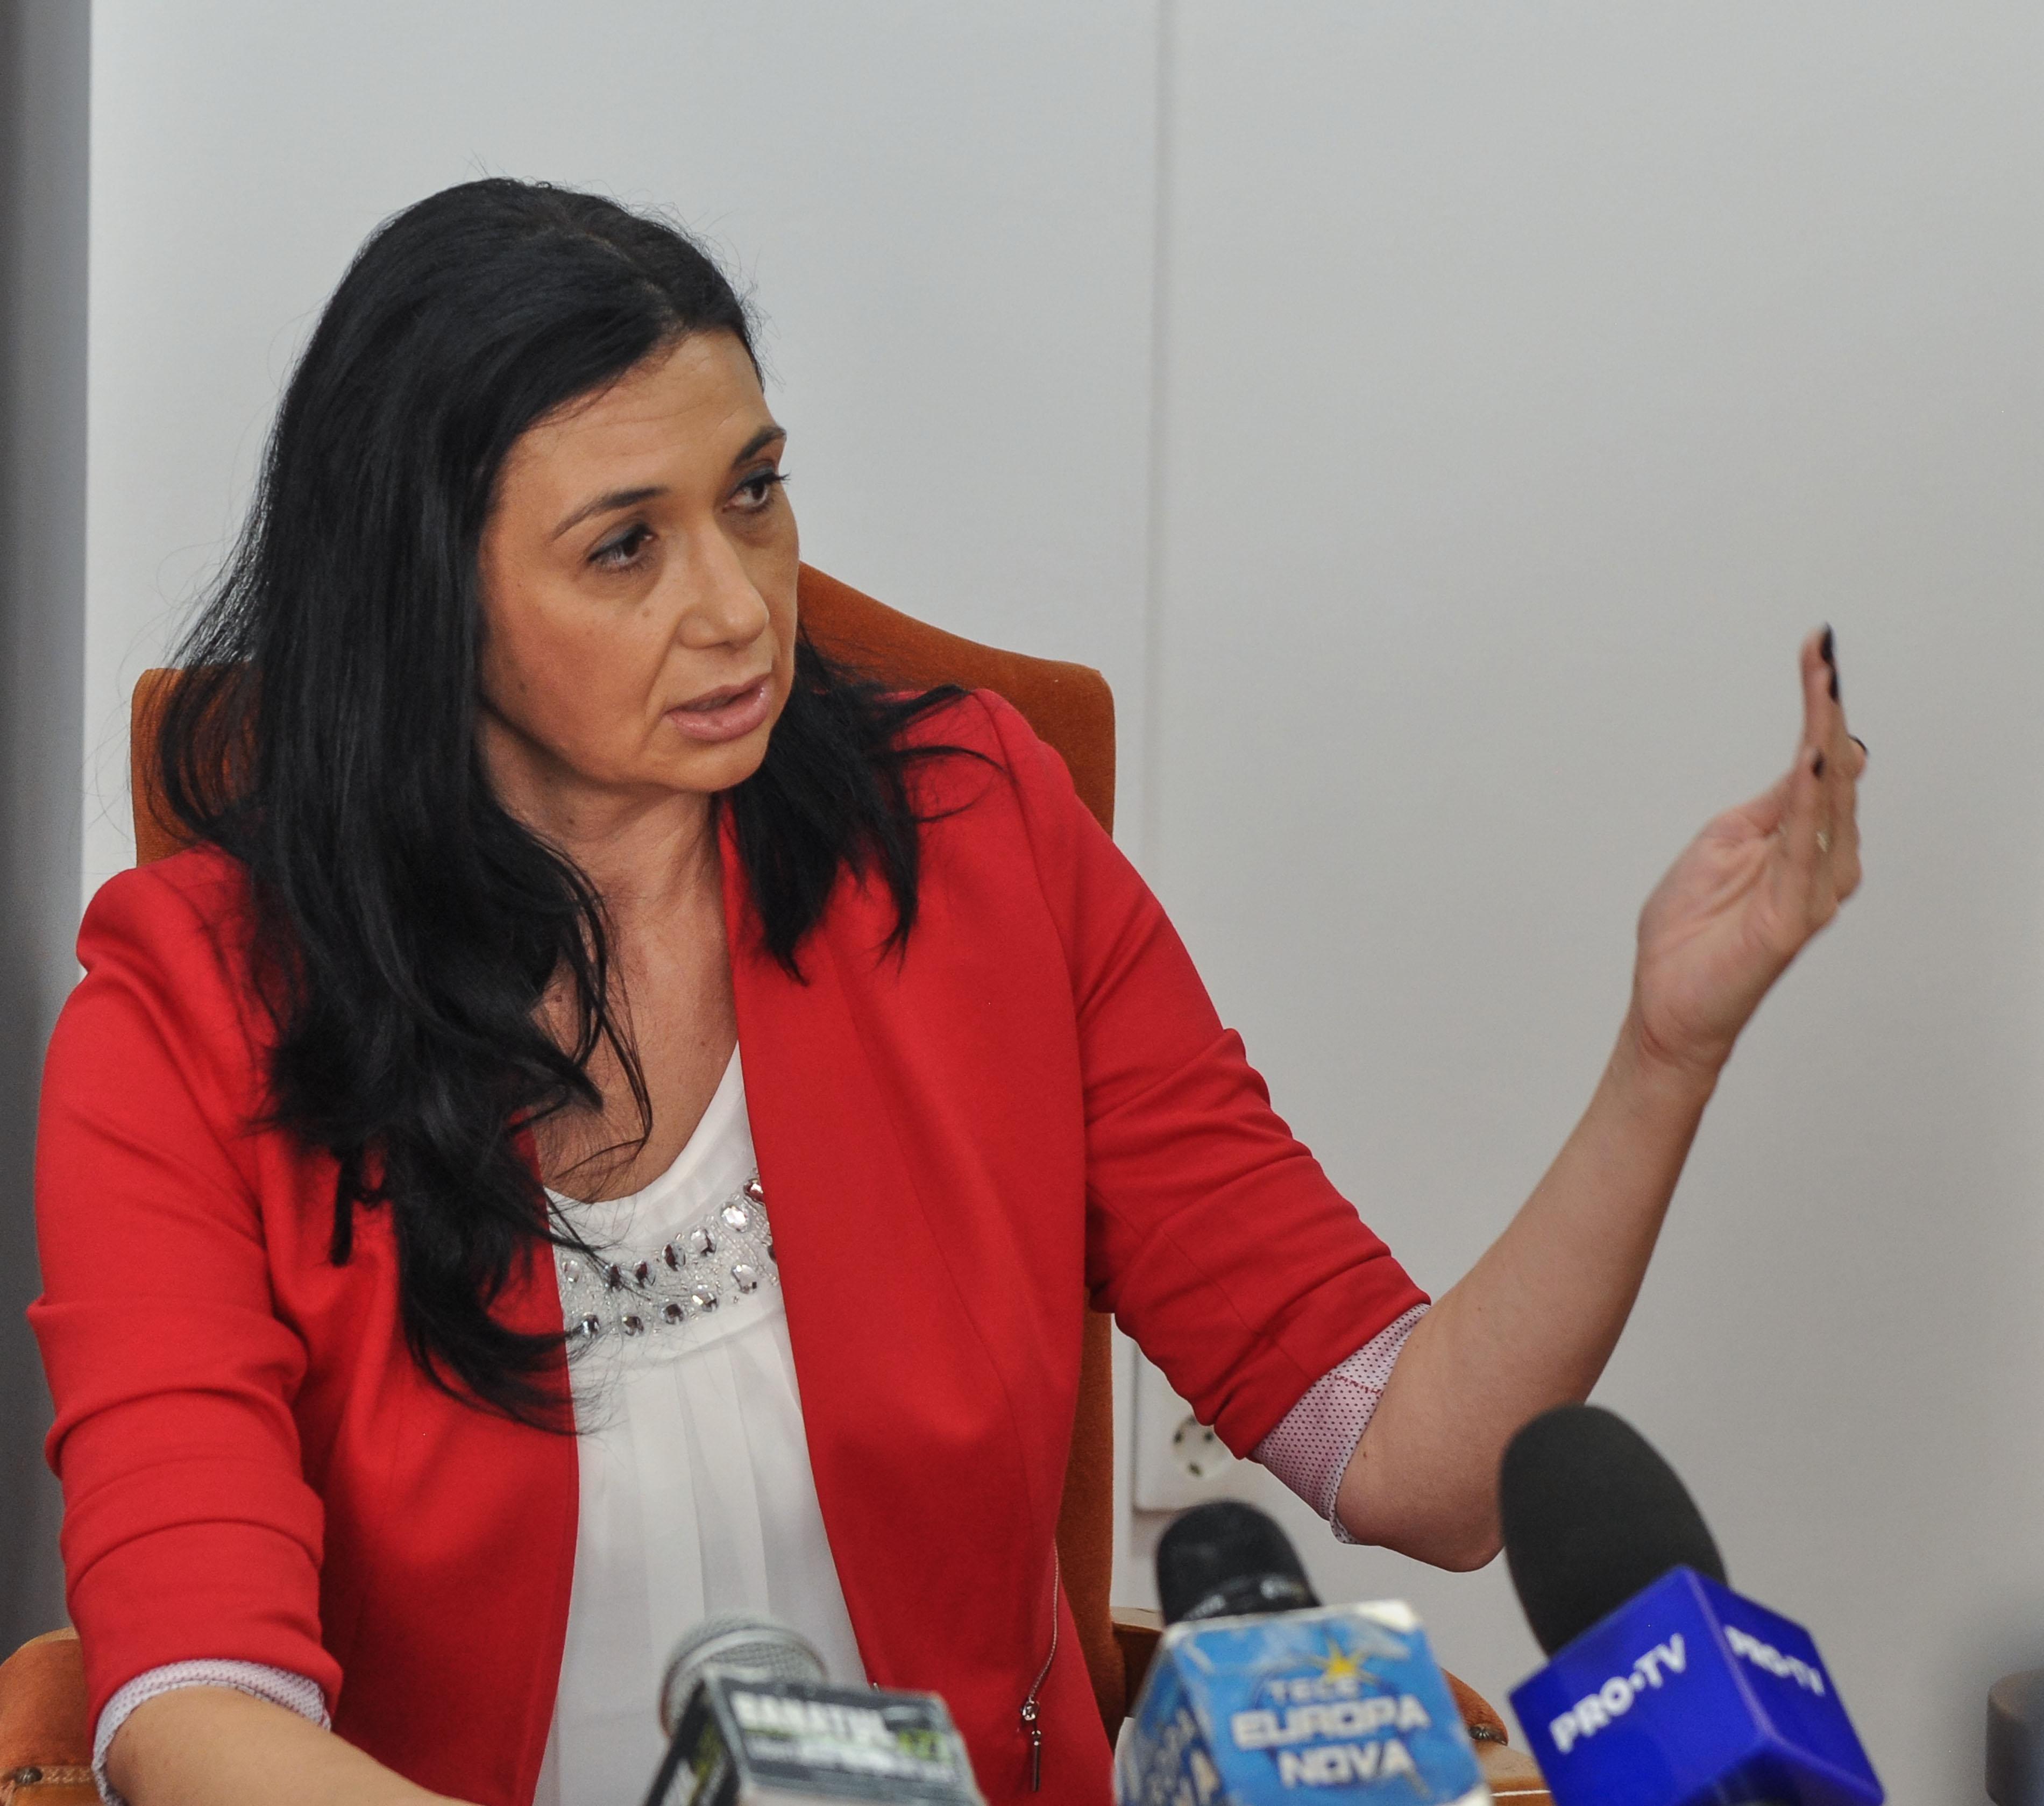 Eva Andreaș, prefect de Timiș